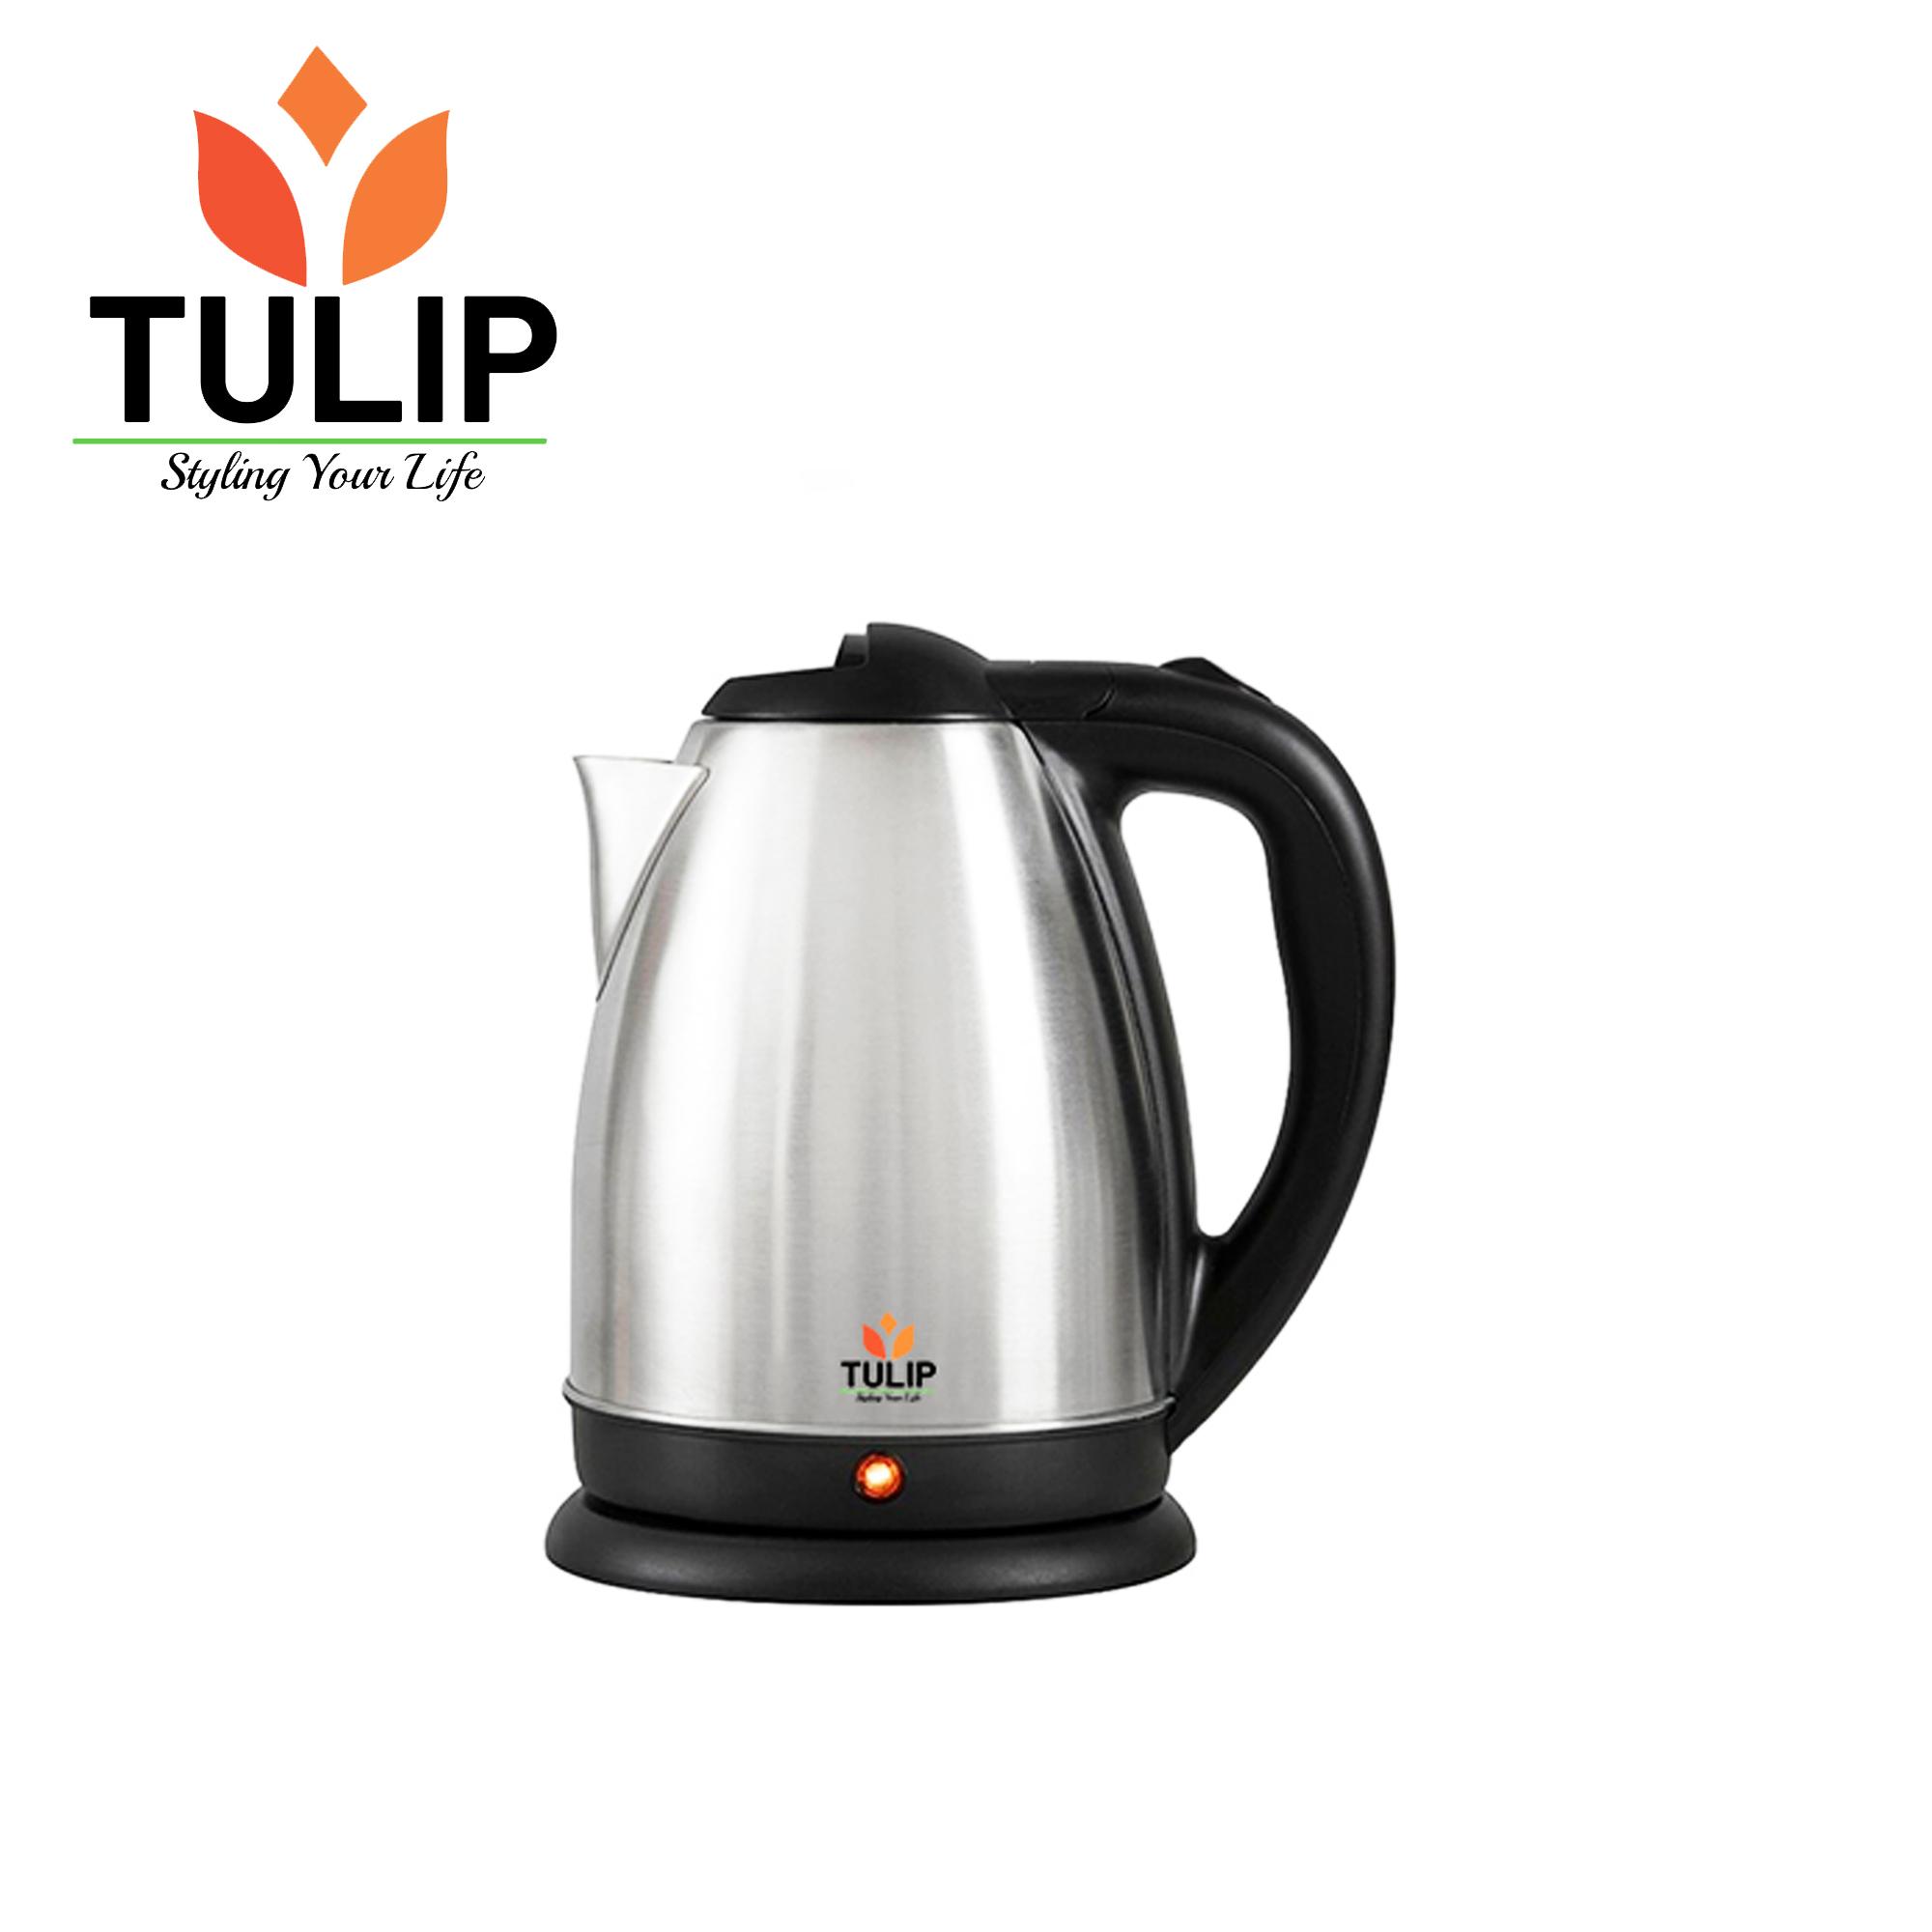 Tulip Hotee Steel Cordless Jug 2 Ltr